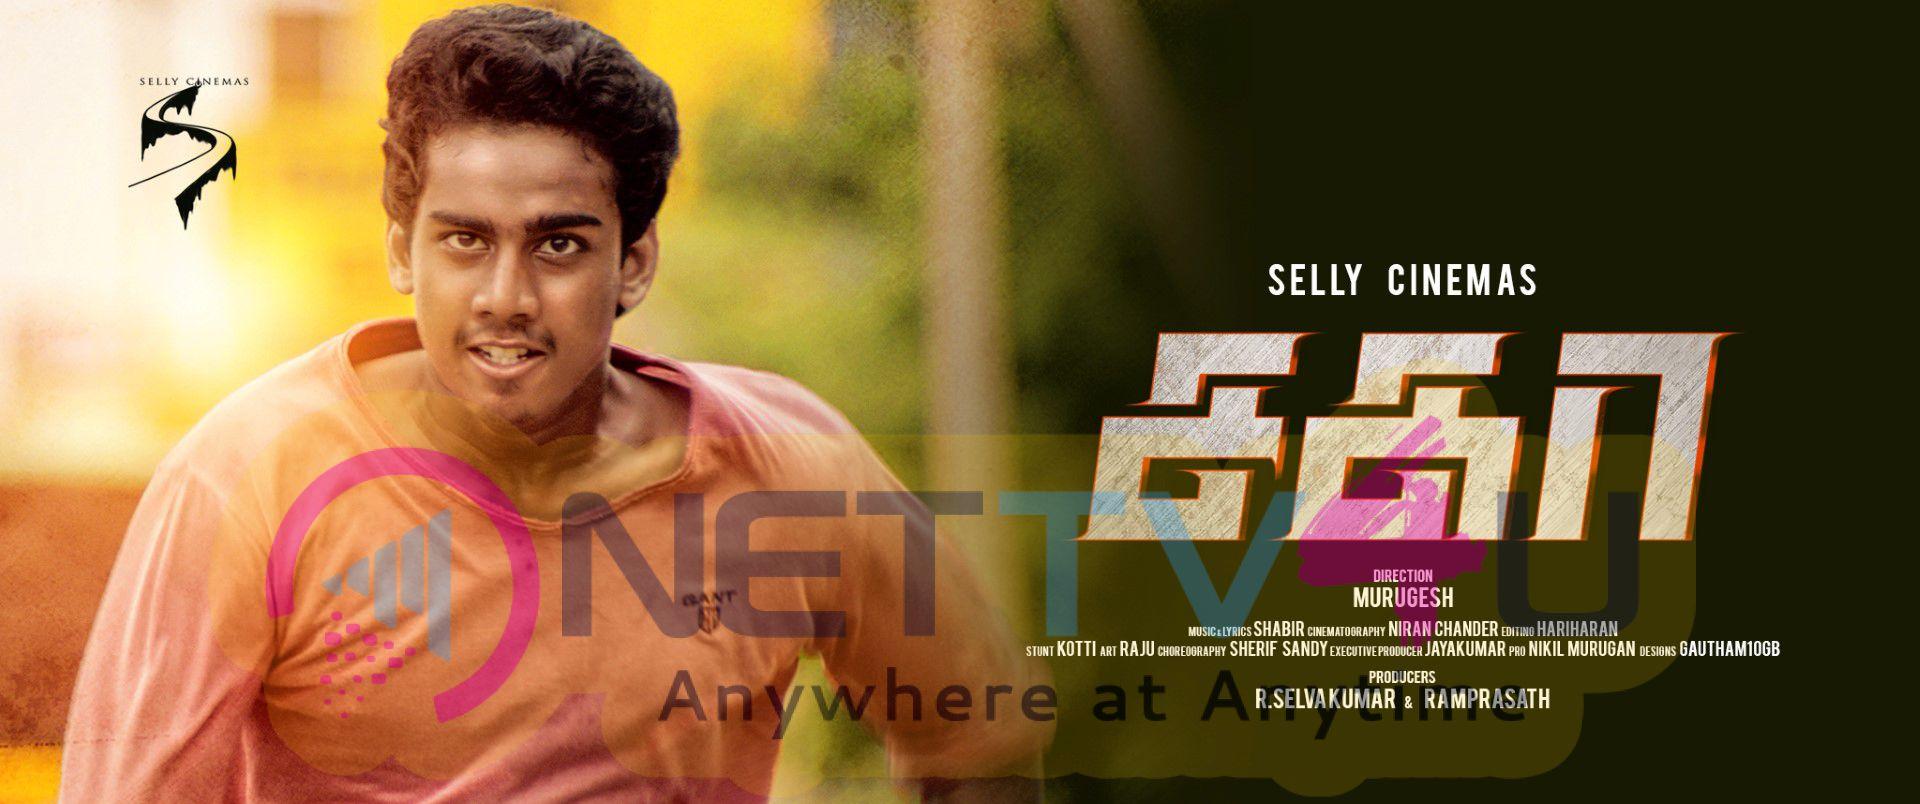 Sagaa Tamil Movie Good Looking Posters